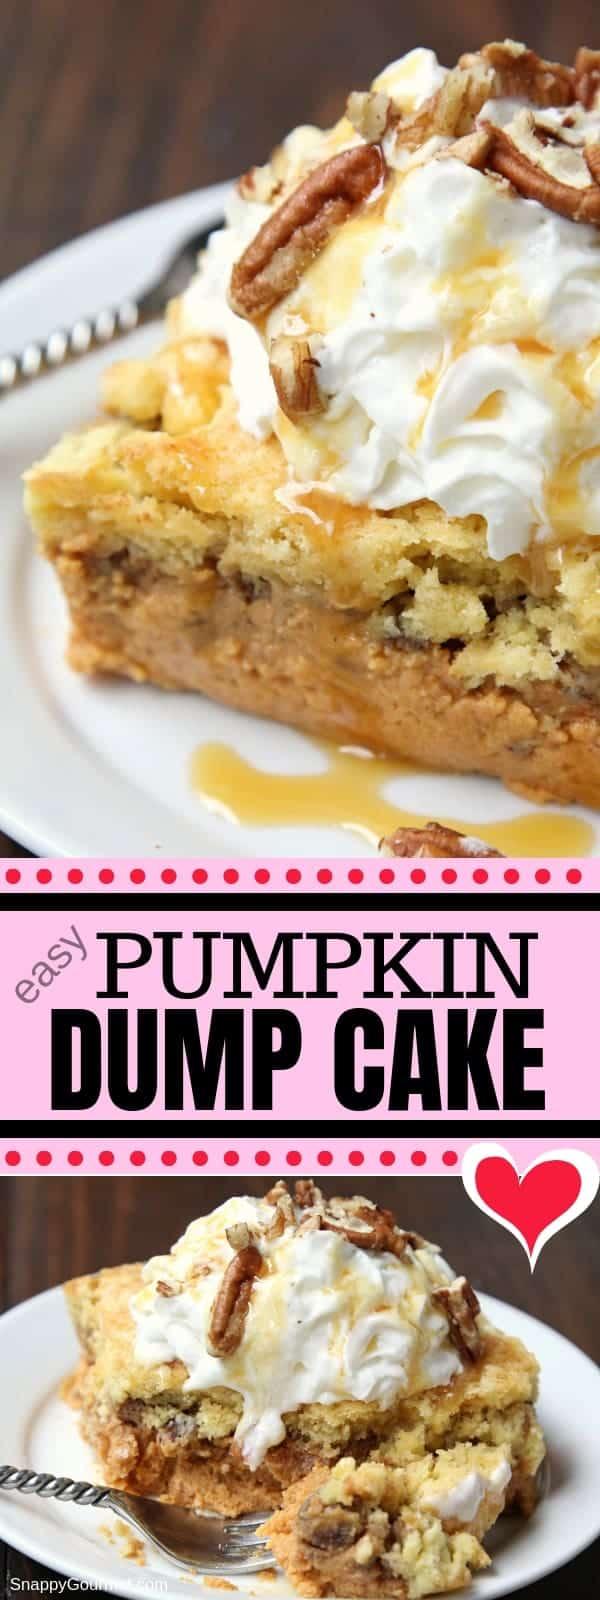 collage of pumpkin dump cake